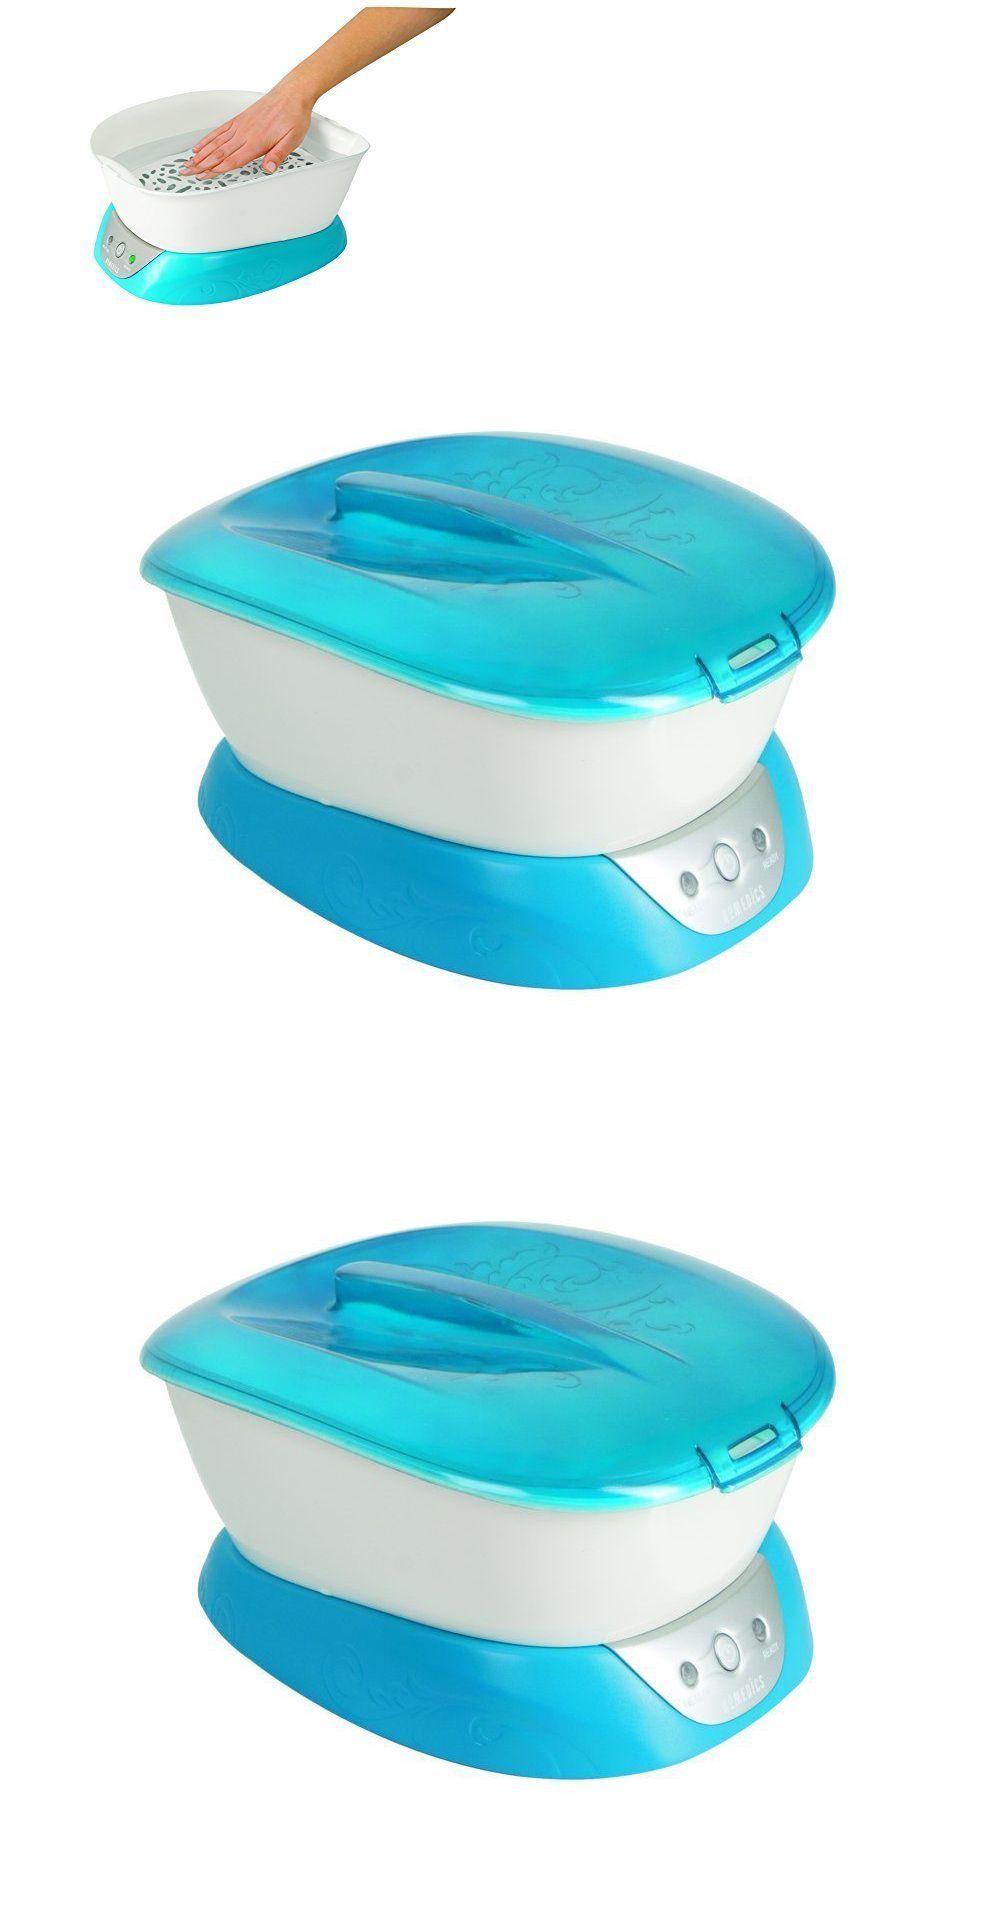 Spas Baths and Supplies: Wax Foot Bath Heat Soak Knee Elbow Paraffin ...